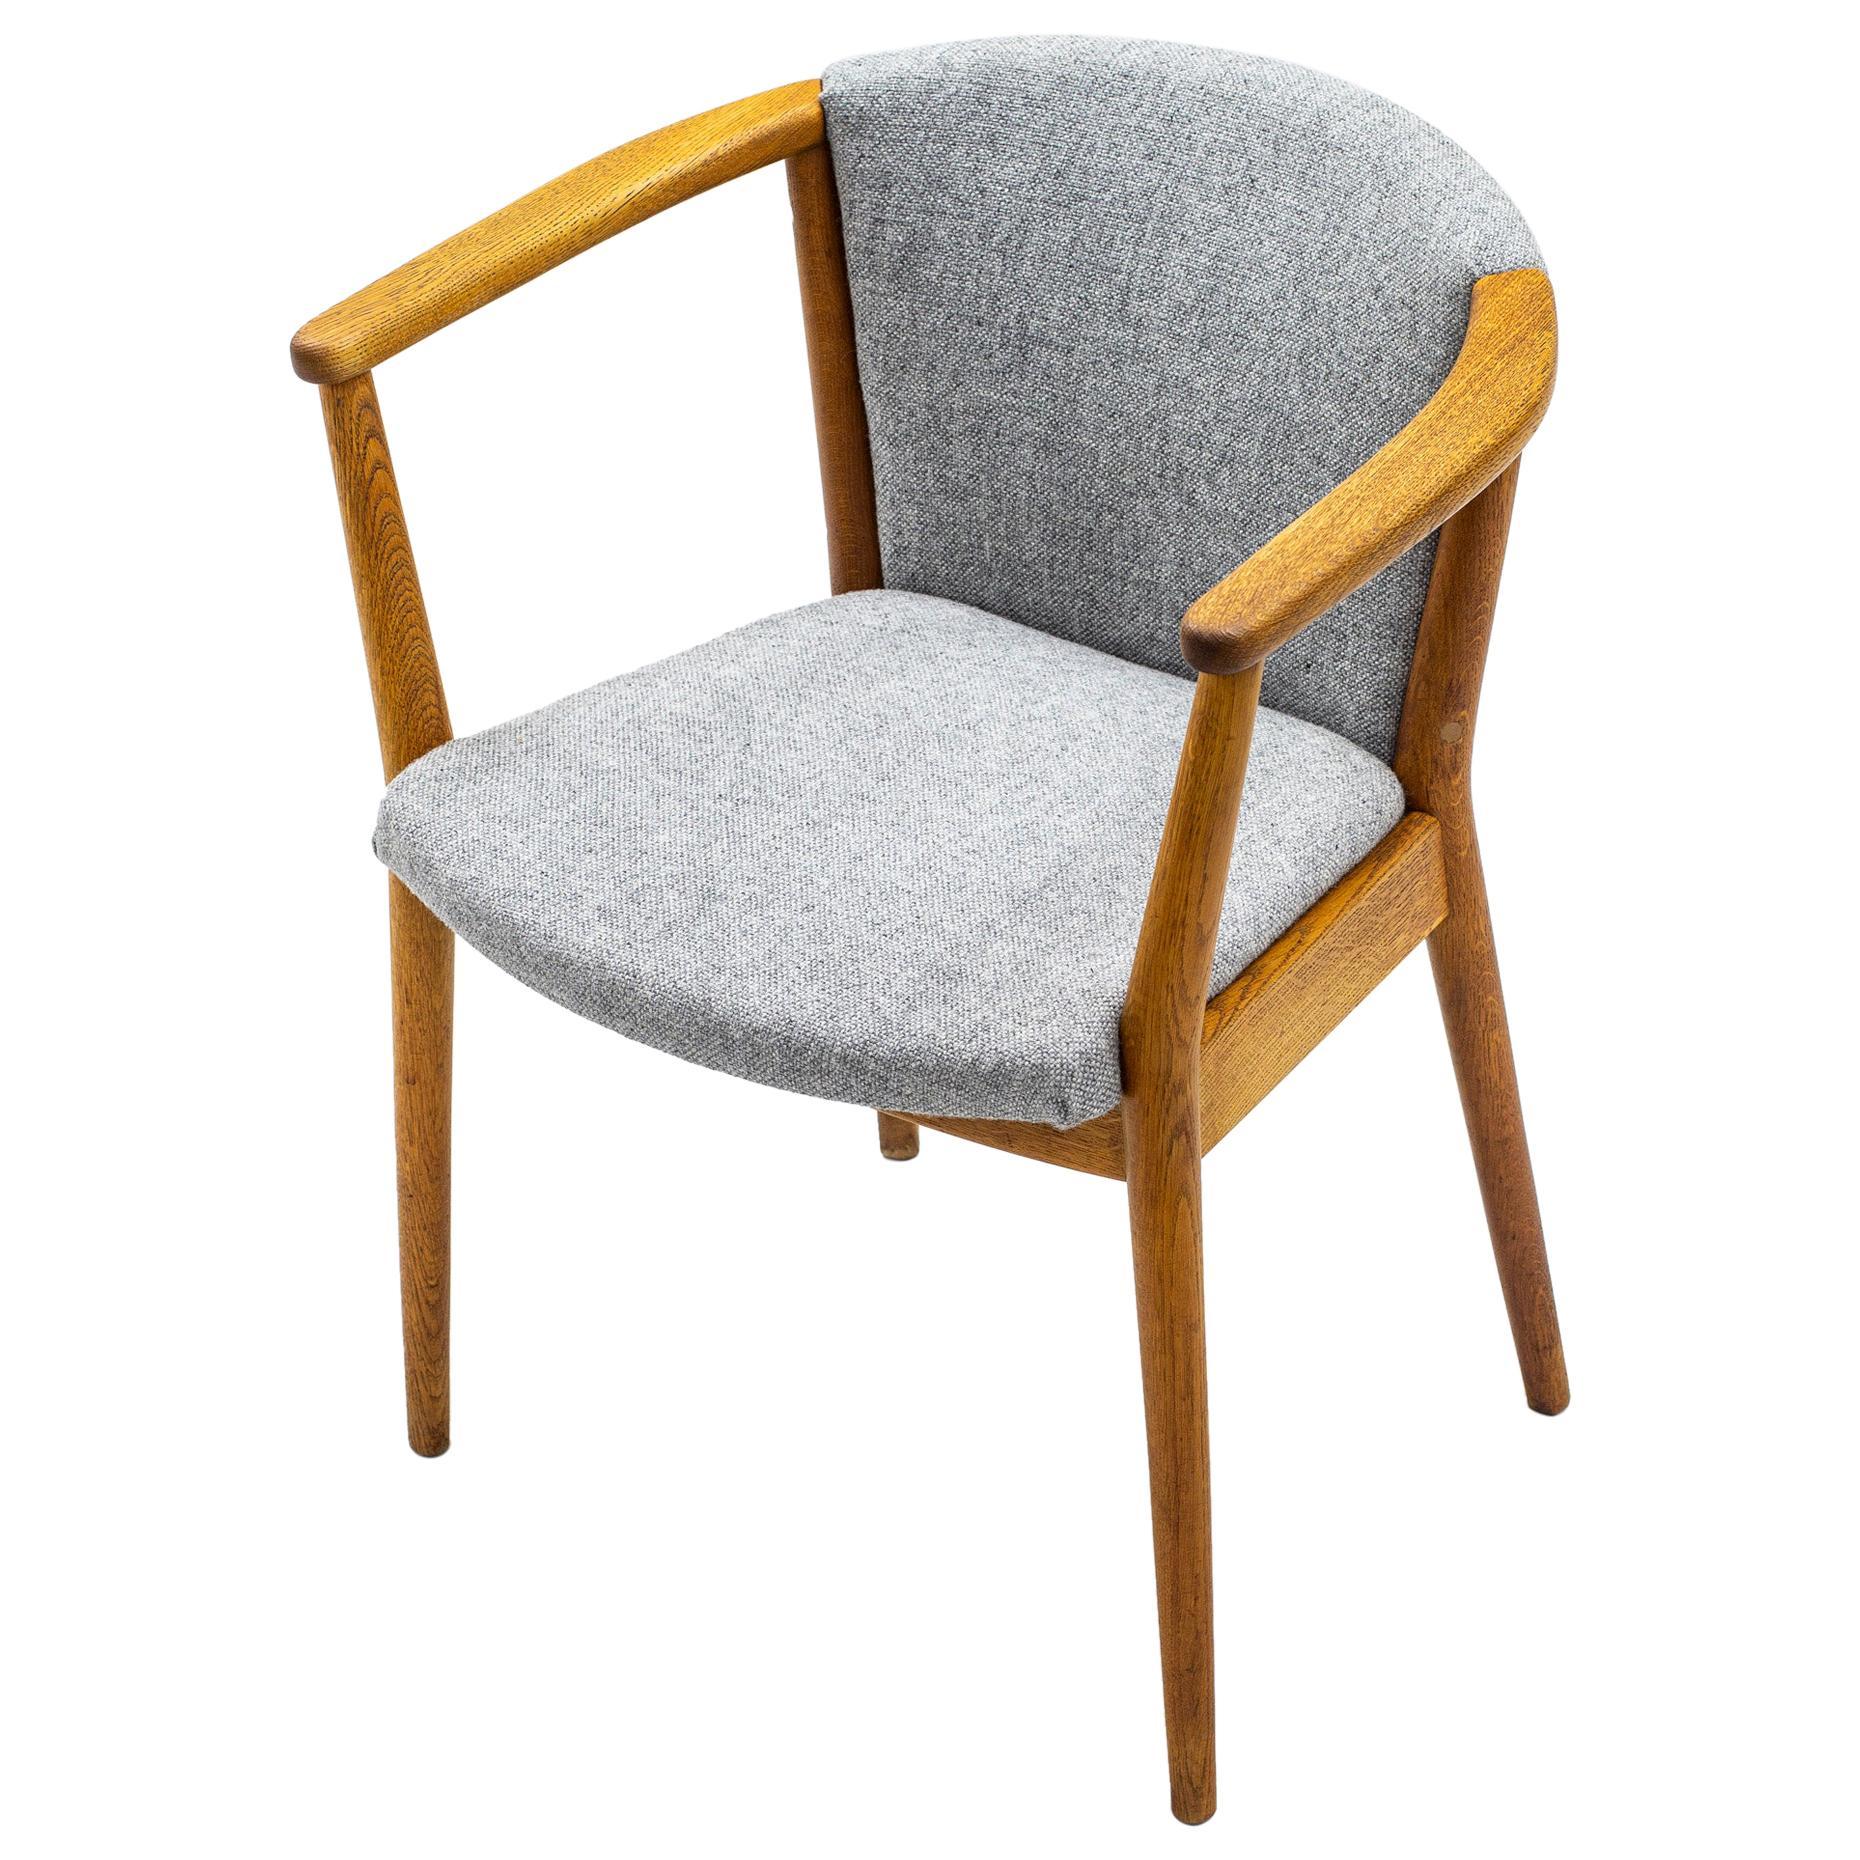 Armchair by Nanna Ditzel, Denmark, Danish Modern by Søren Willadsen, 1950s